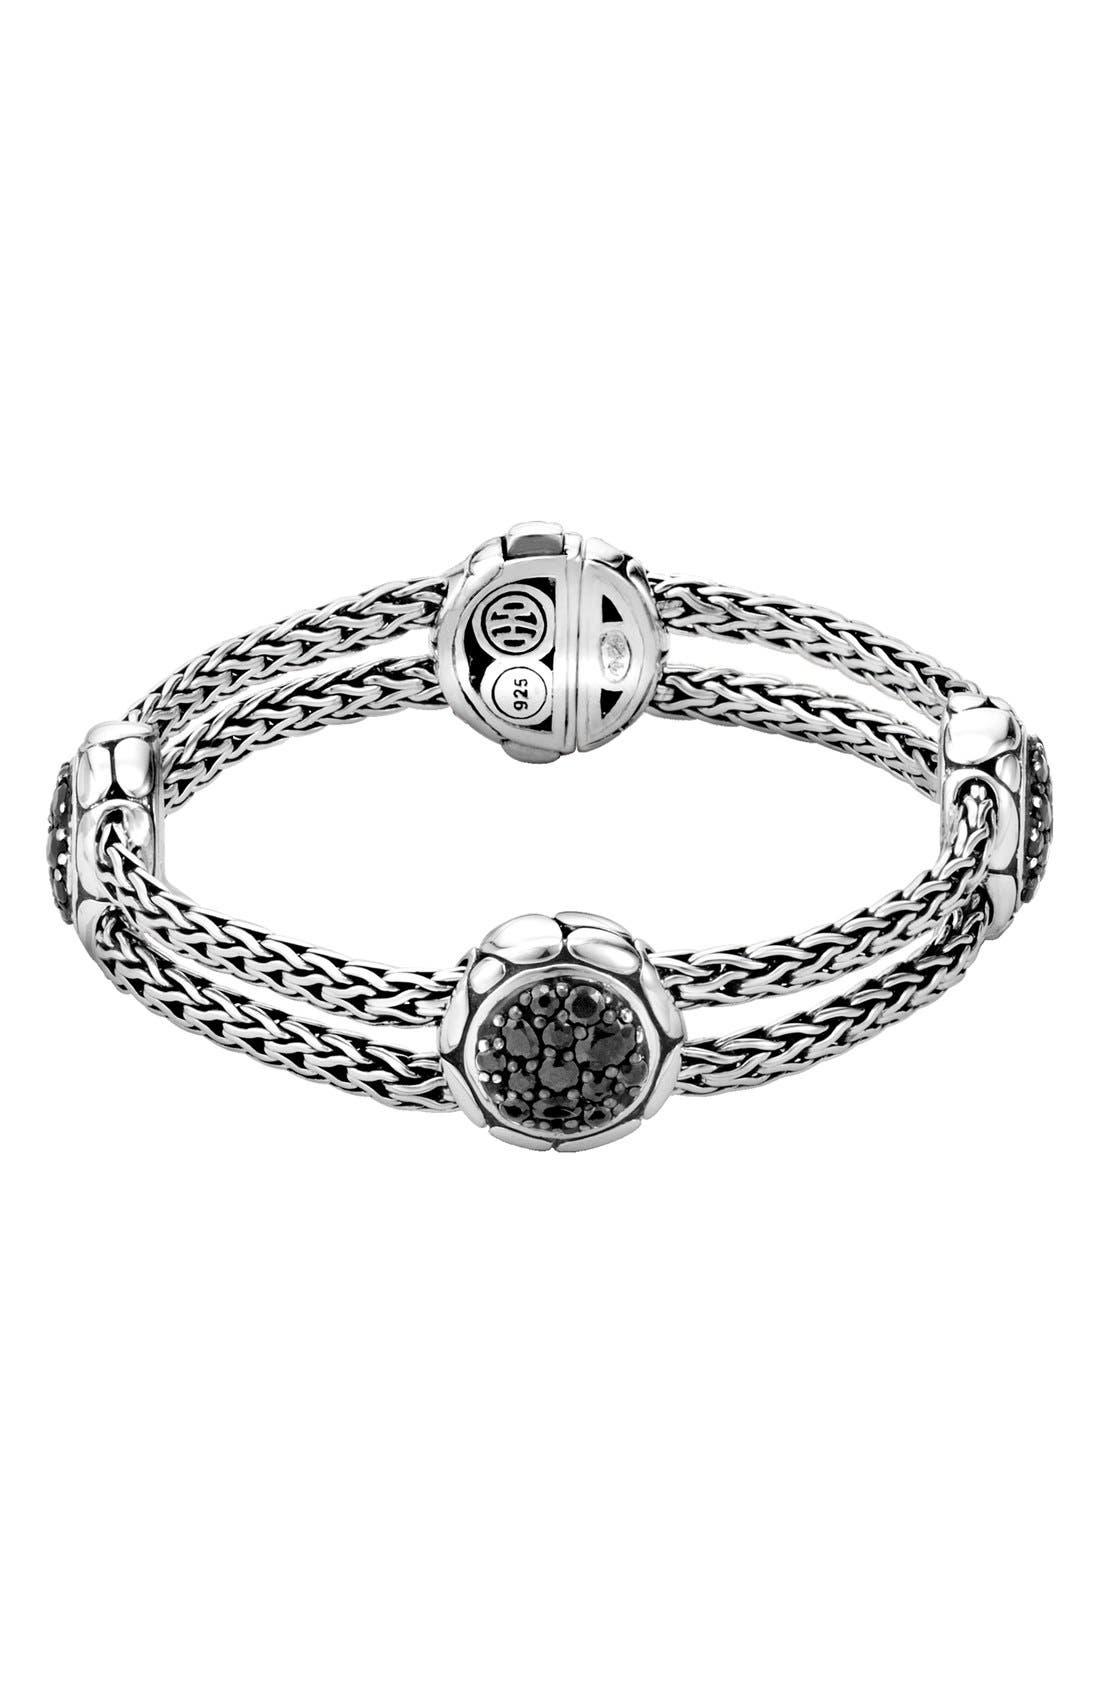 John Hardy 'Kali' Black Sapphire Bracelet